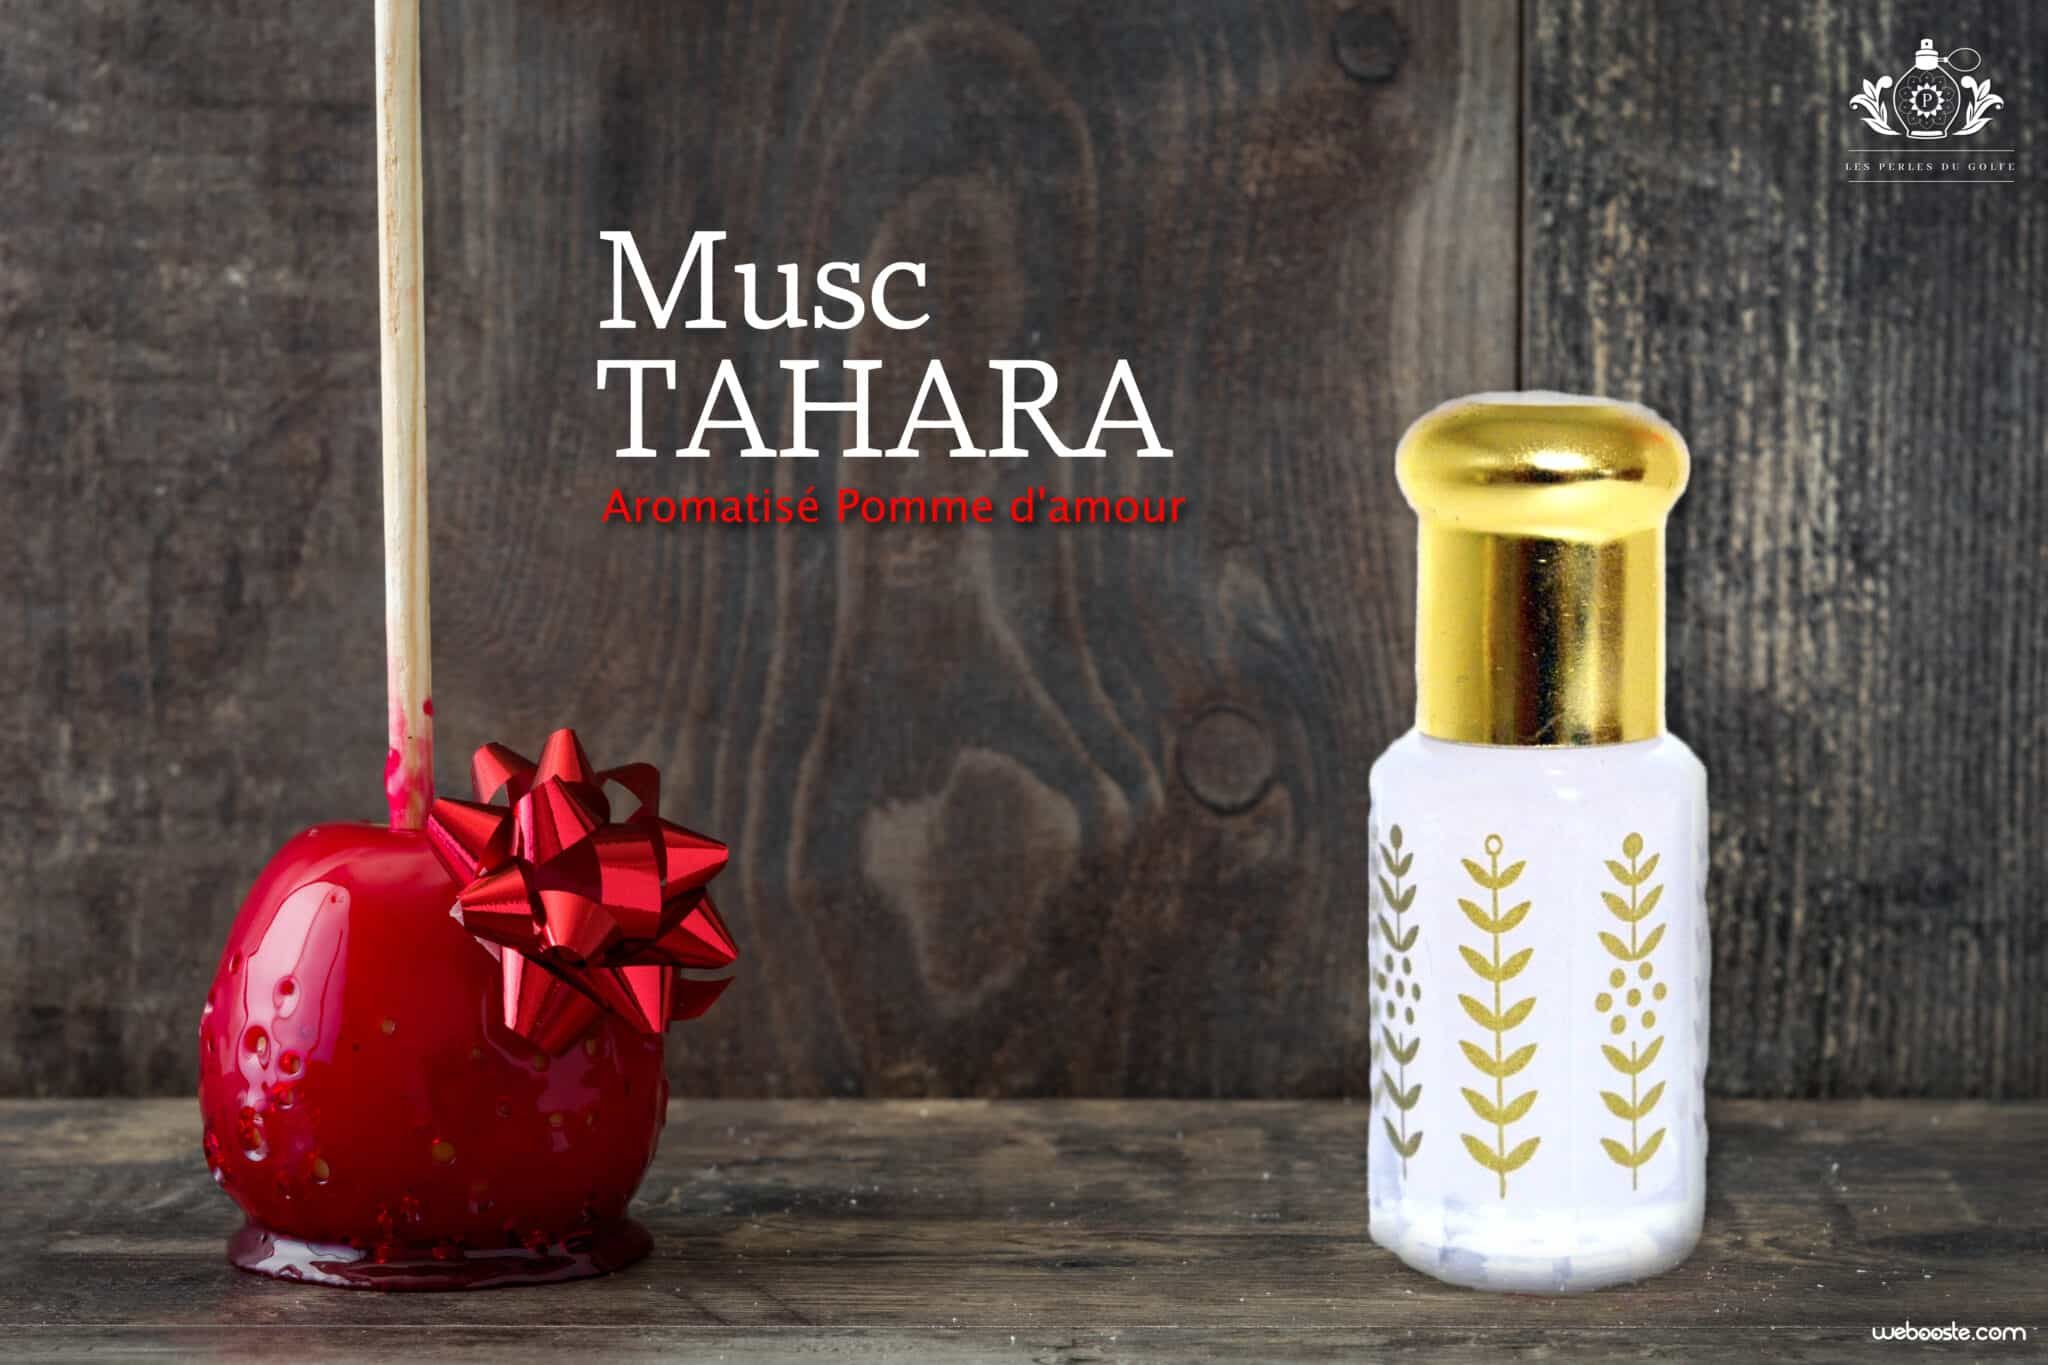 musc tahara aromatisé pomme amour bois